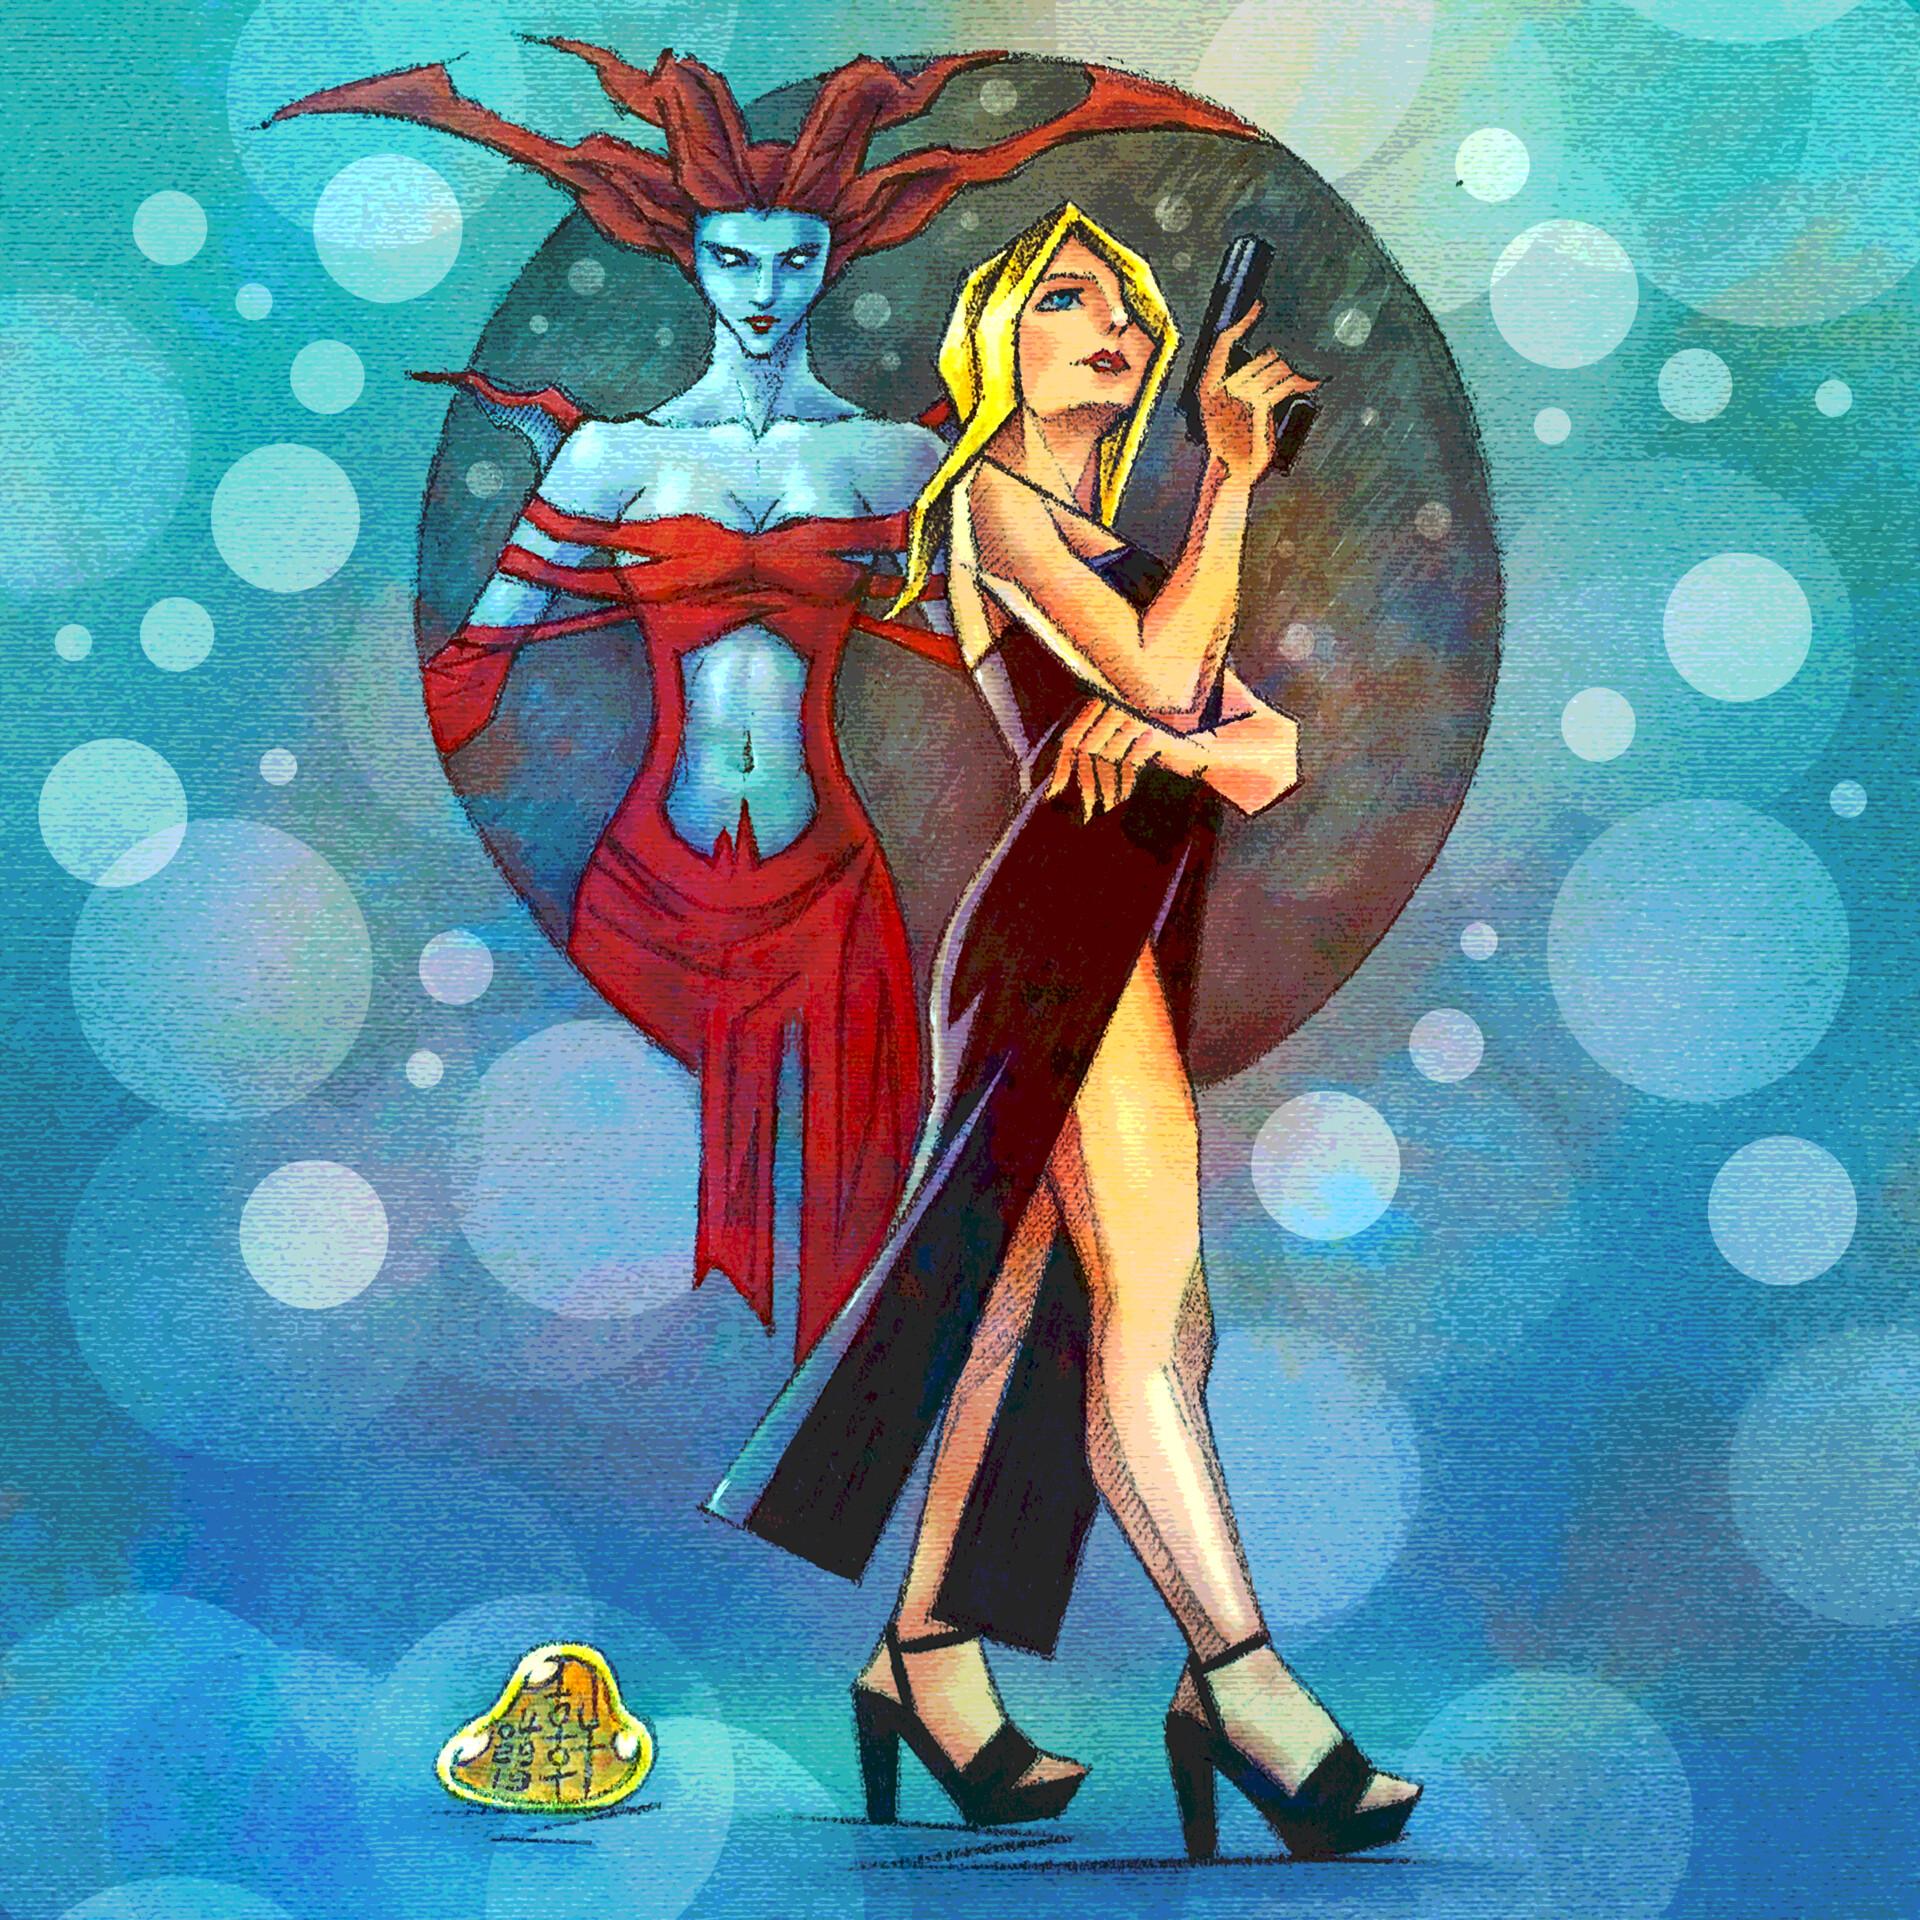 Aya and Eve - Version I